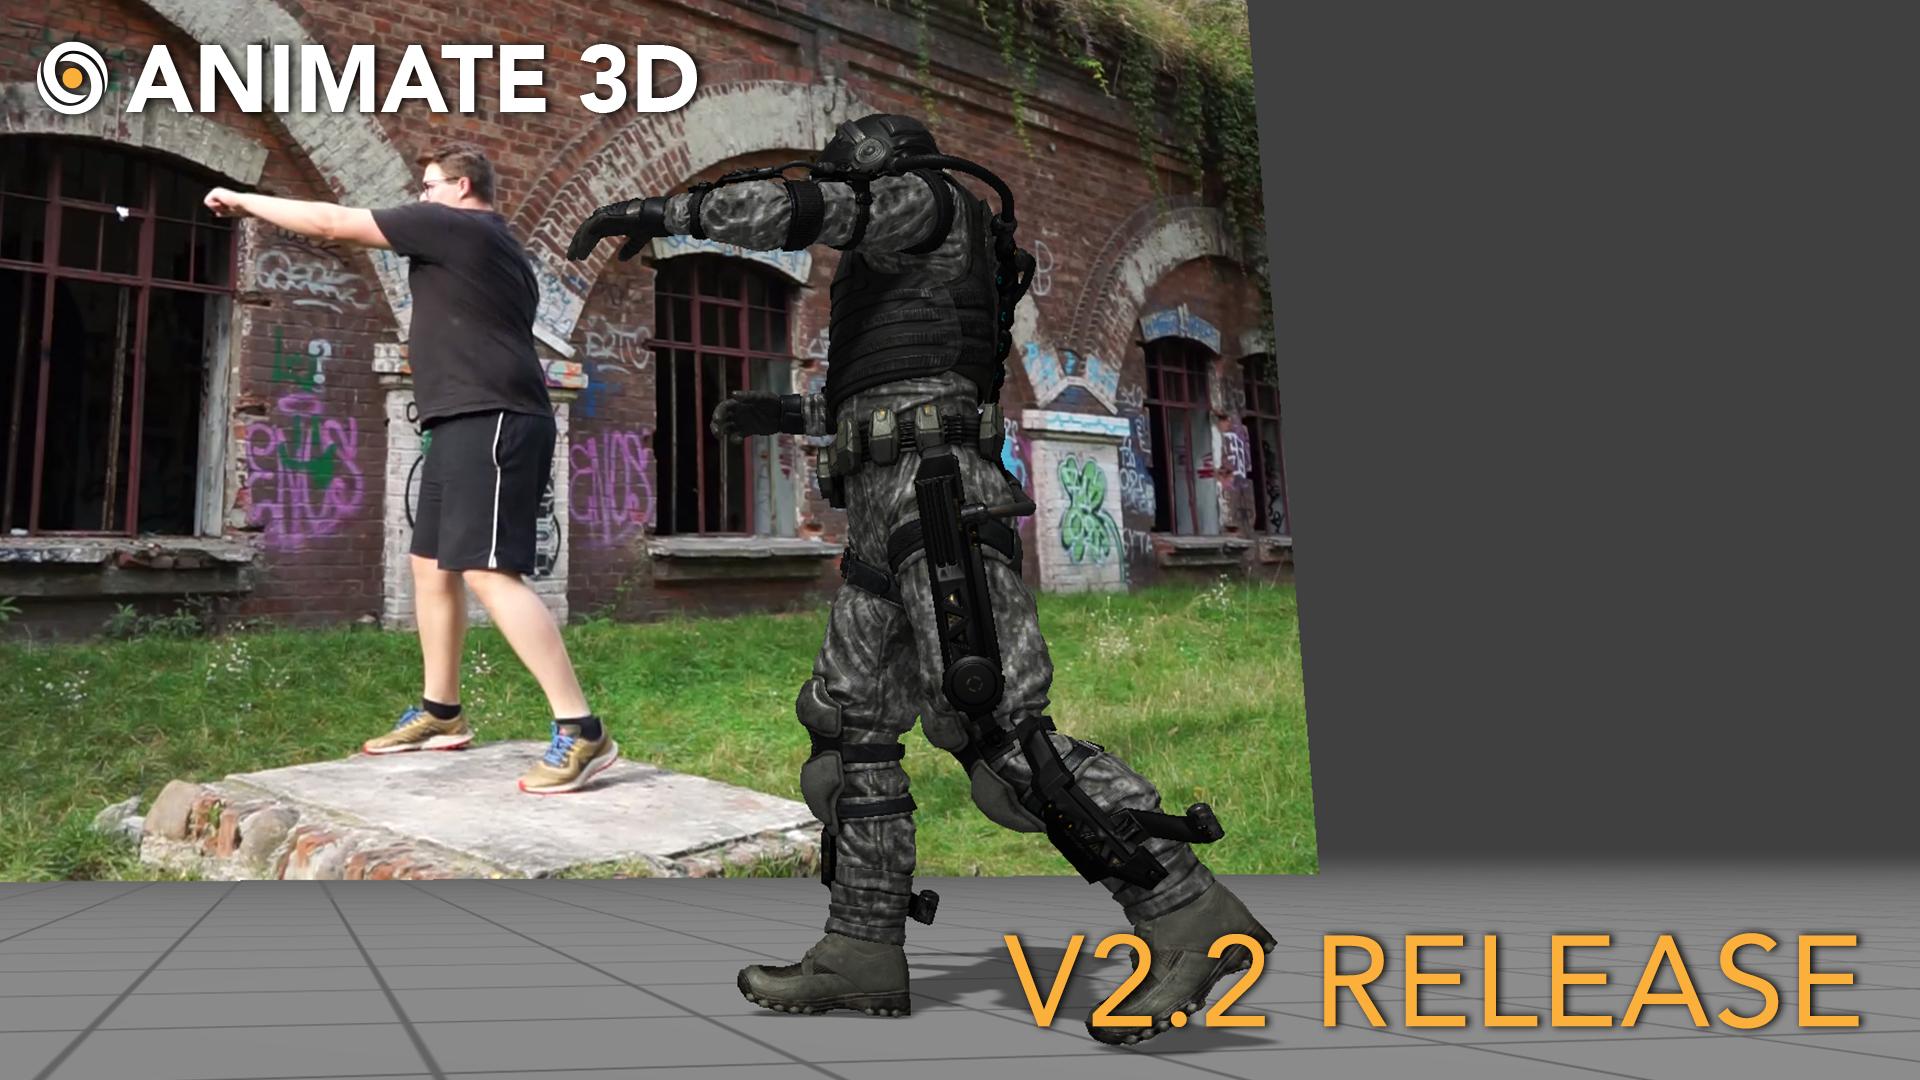 Animate 3D - V 2.2 Release